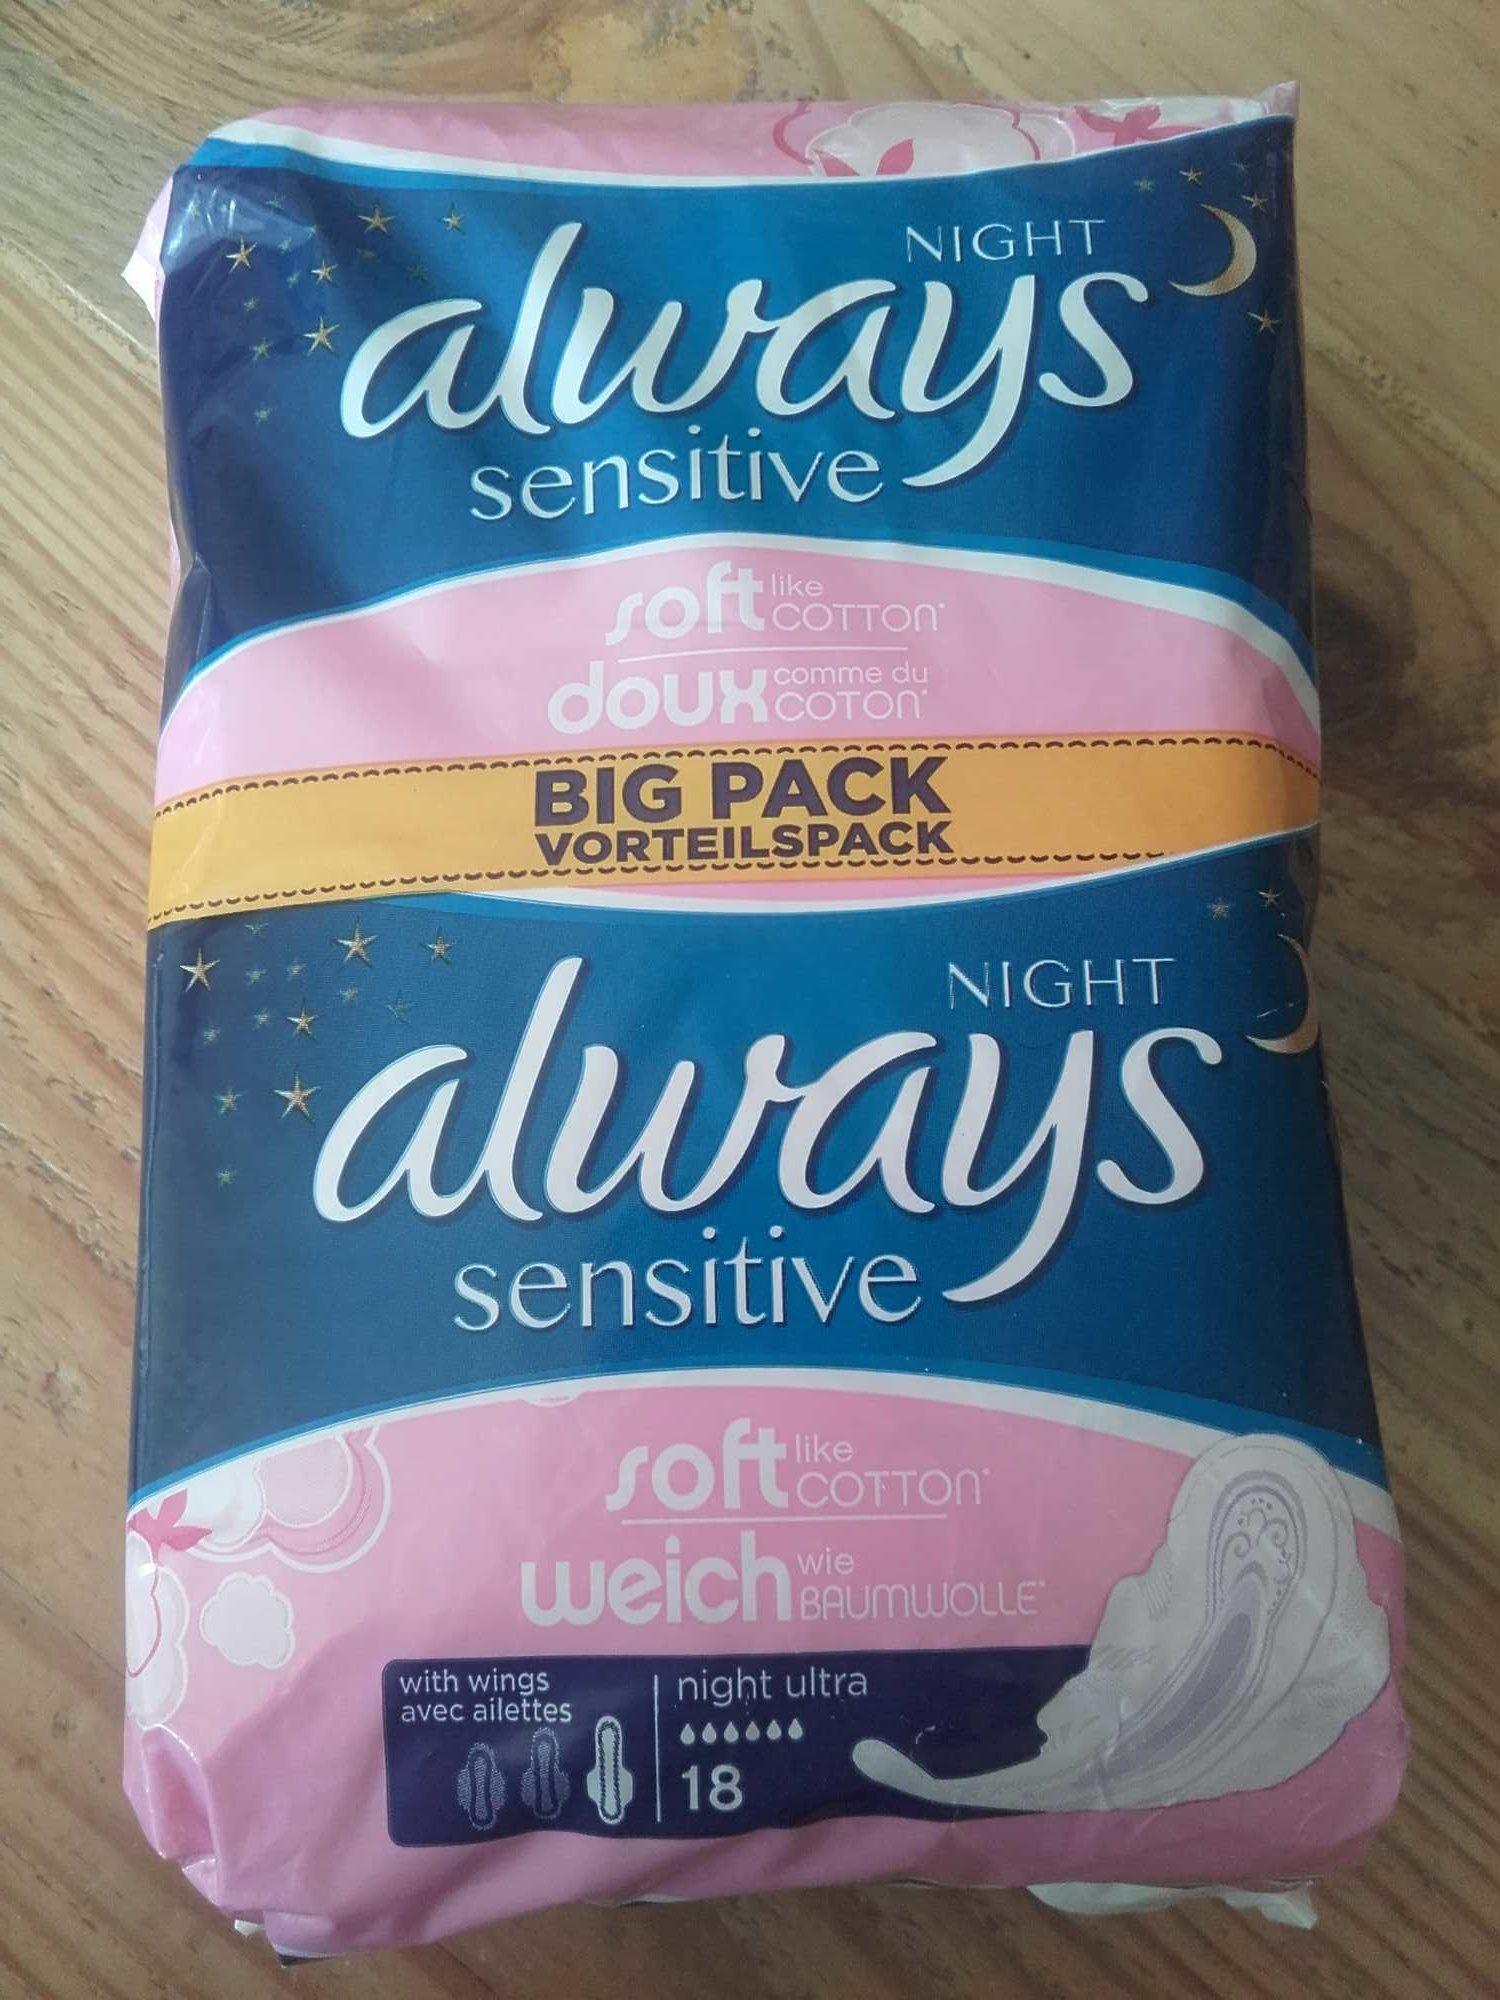 Night Always sensitive - Product - fr